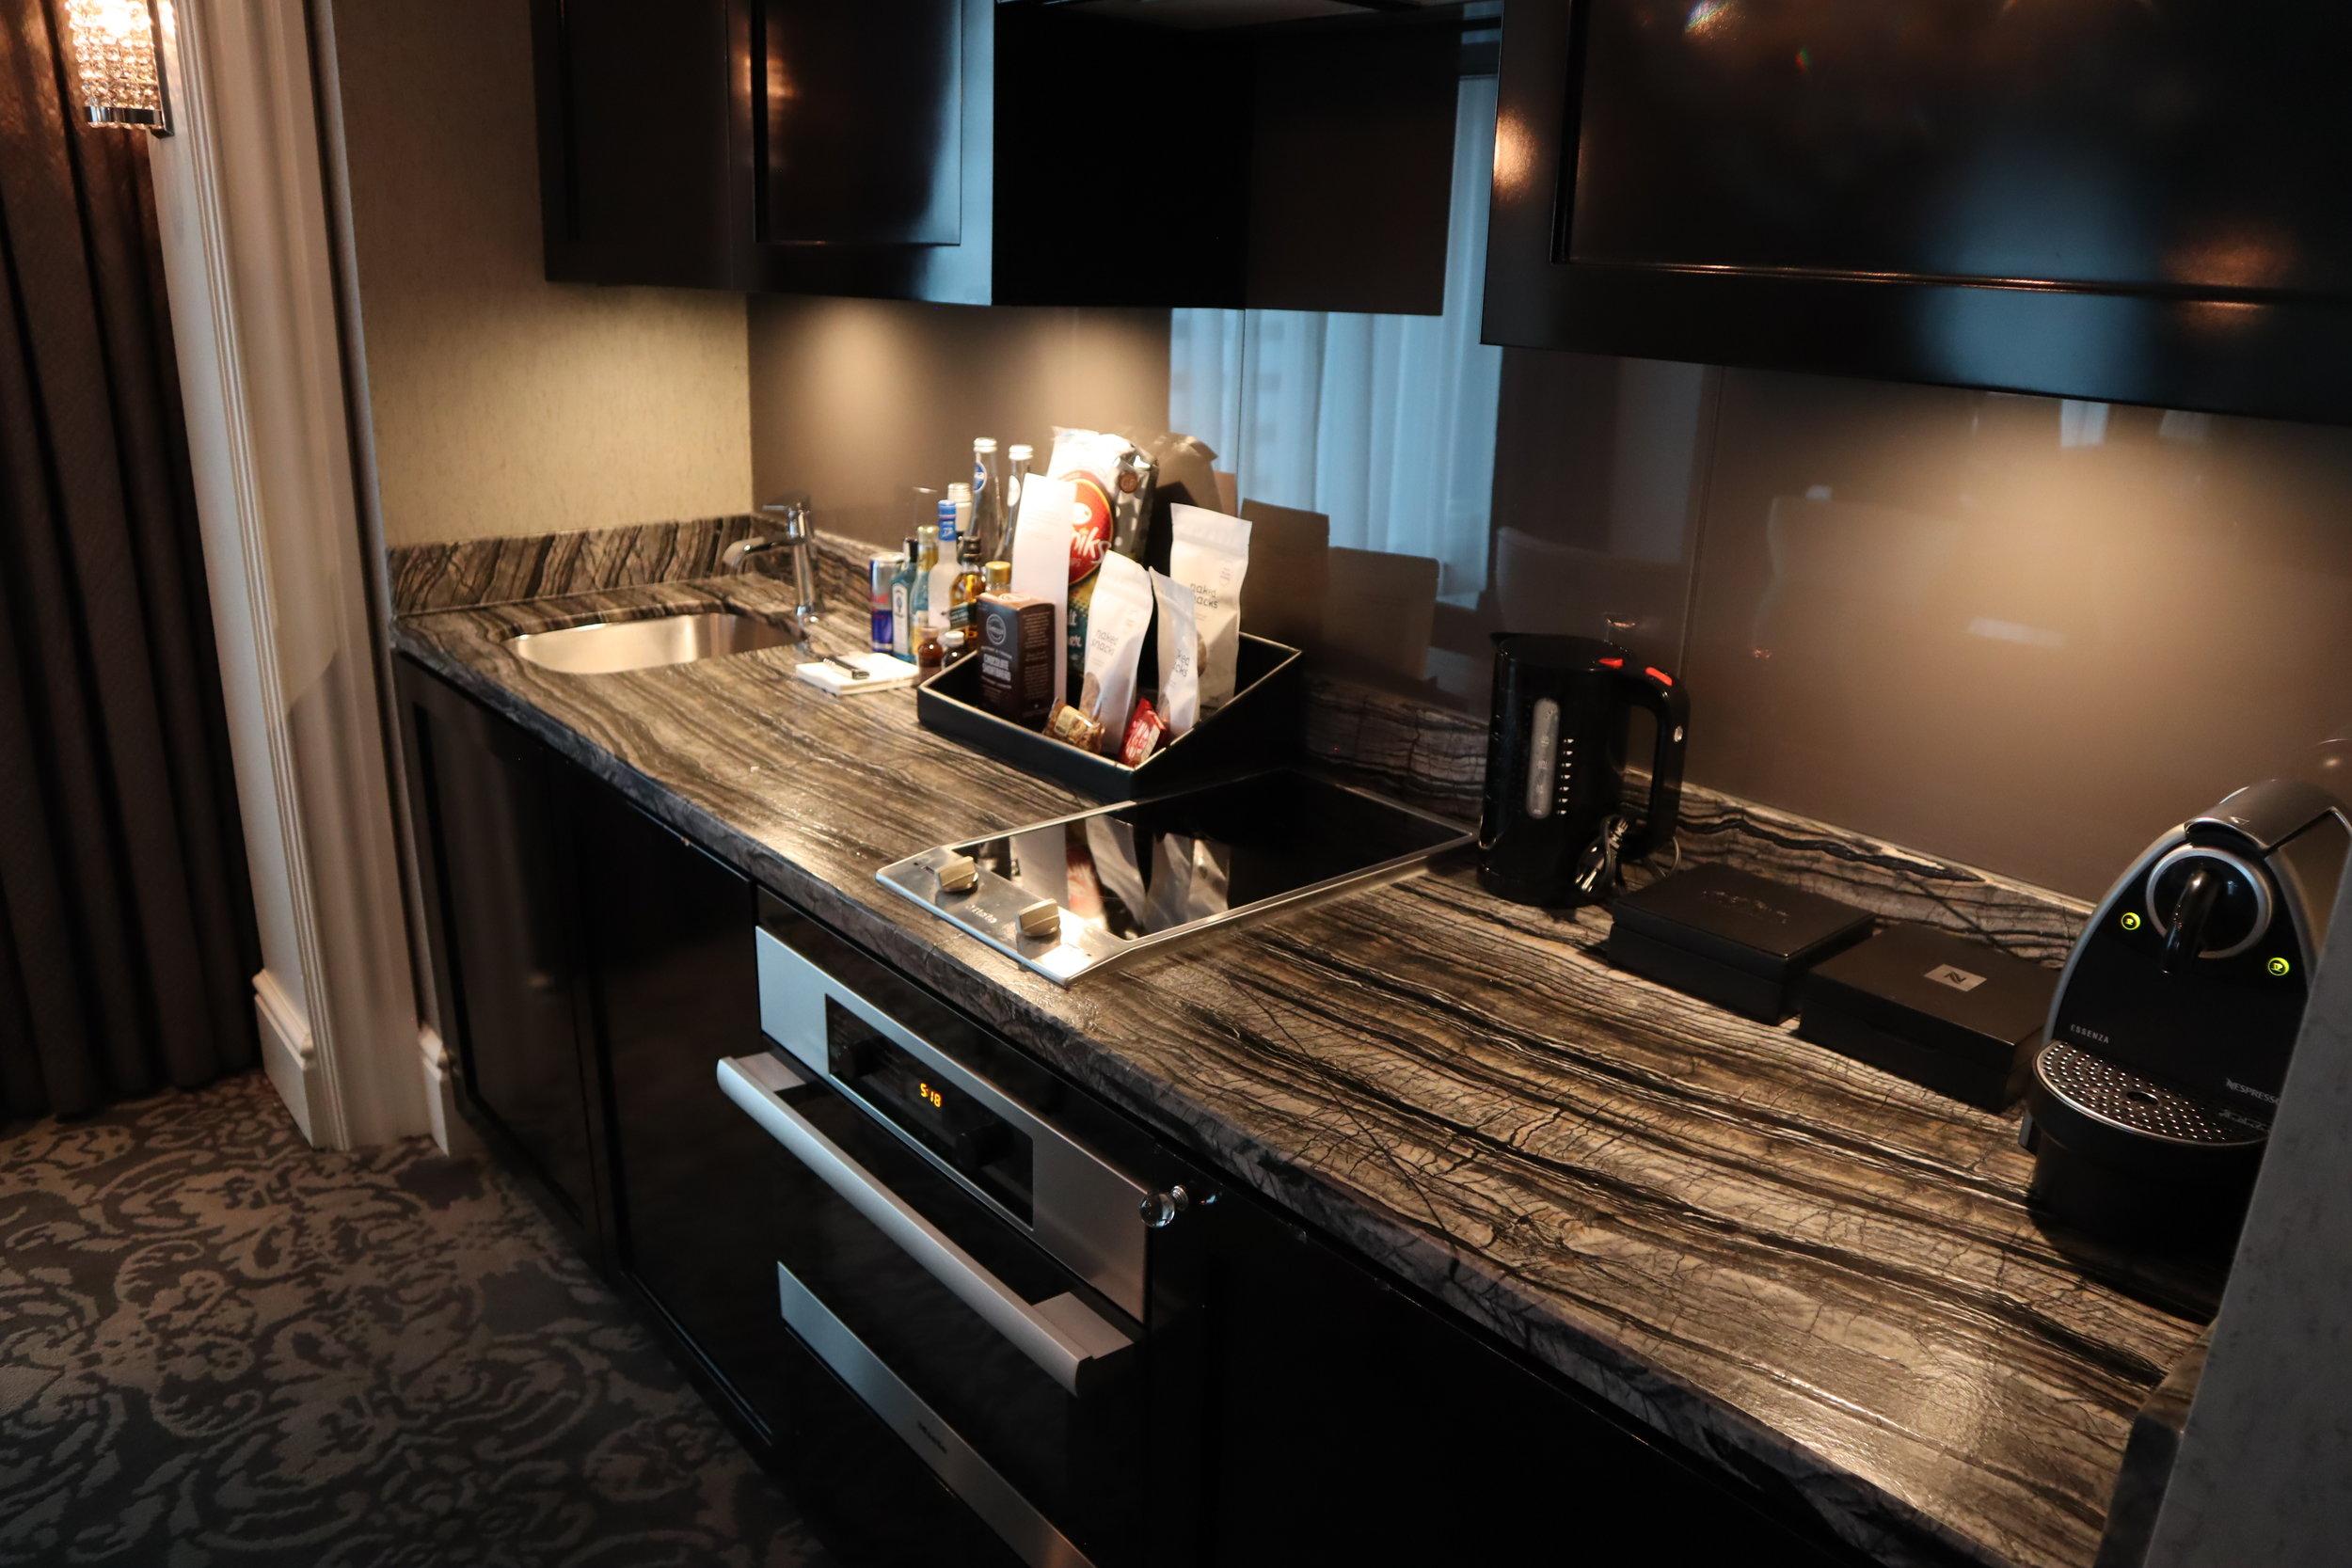 St. Regis Toronto – Two-bedroom suite kitchenette